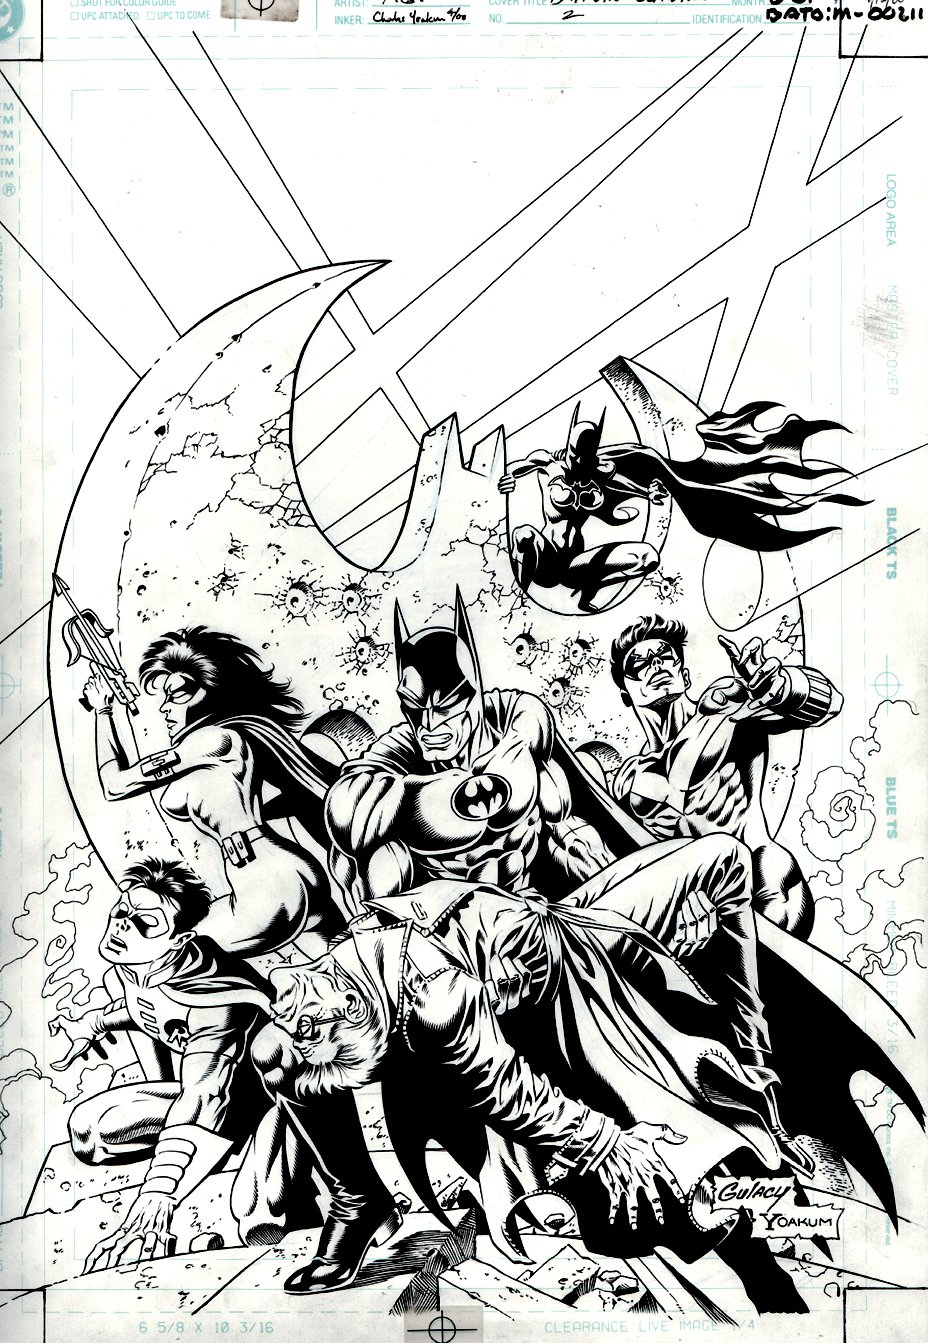 Batman: Outlaws #2 Cover (Batman, Nightwing, Batgirl, Huntress, Robin) 2000